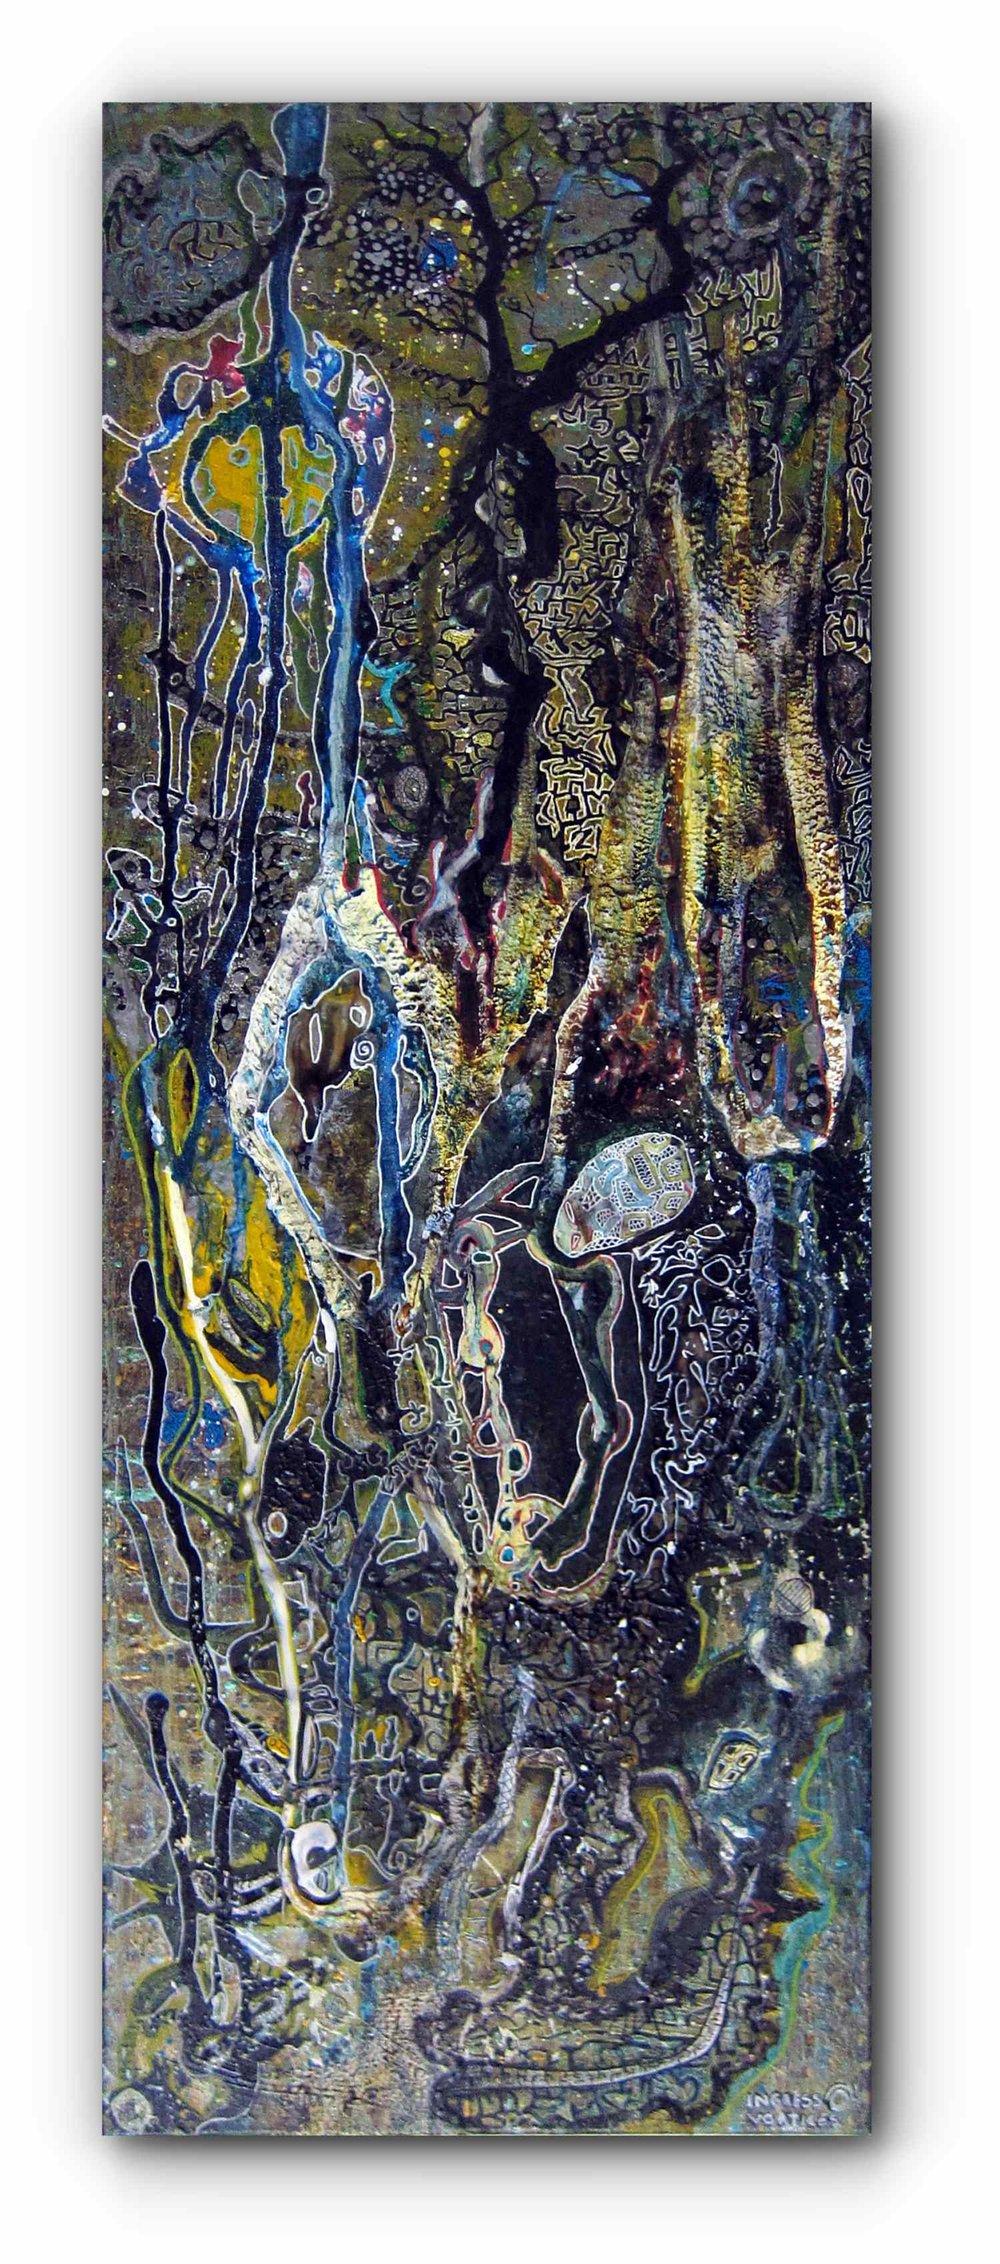 painting-vesperal-prosody-artist-duo-ingress-vortices.jpg